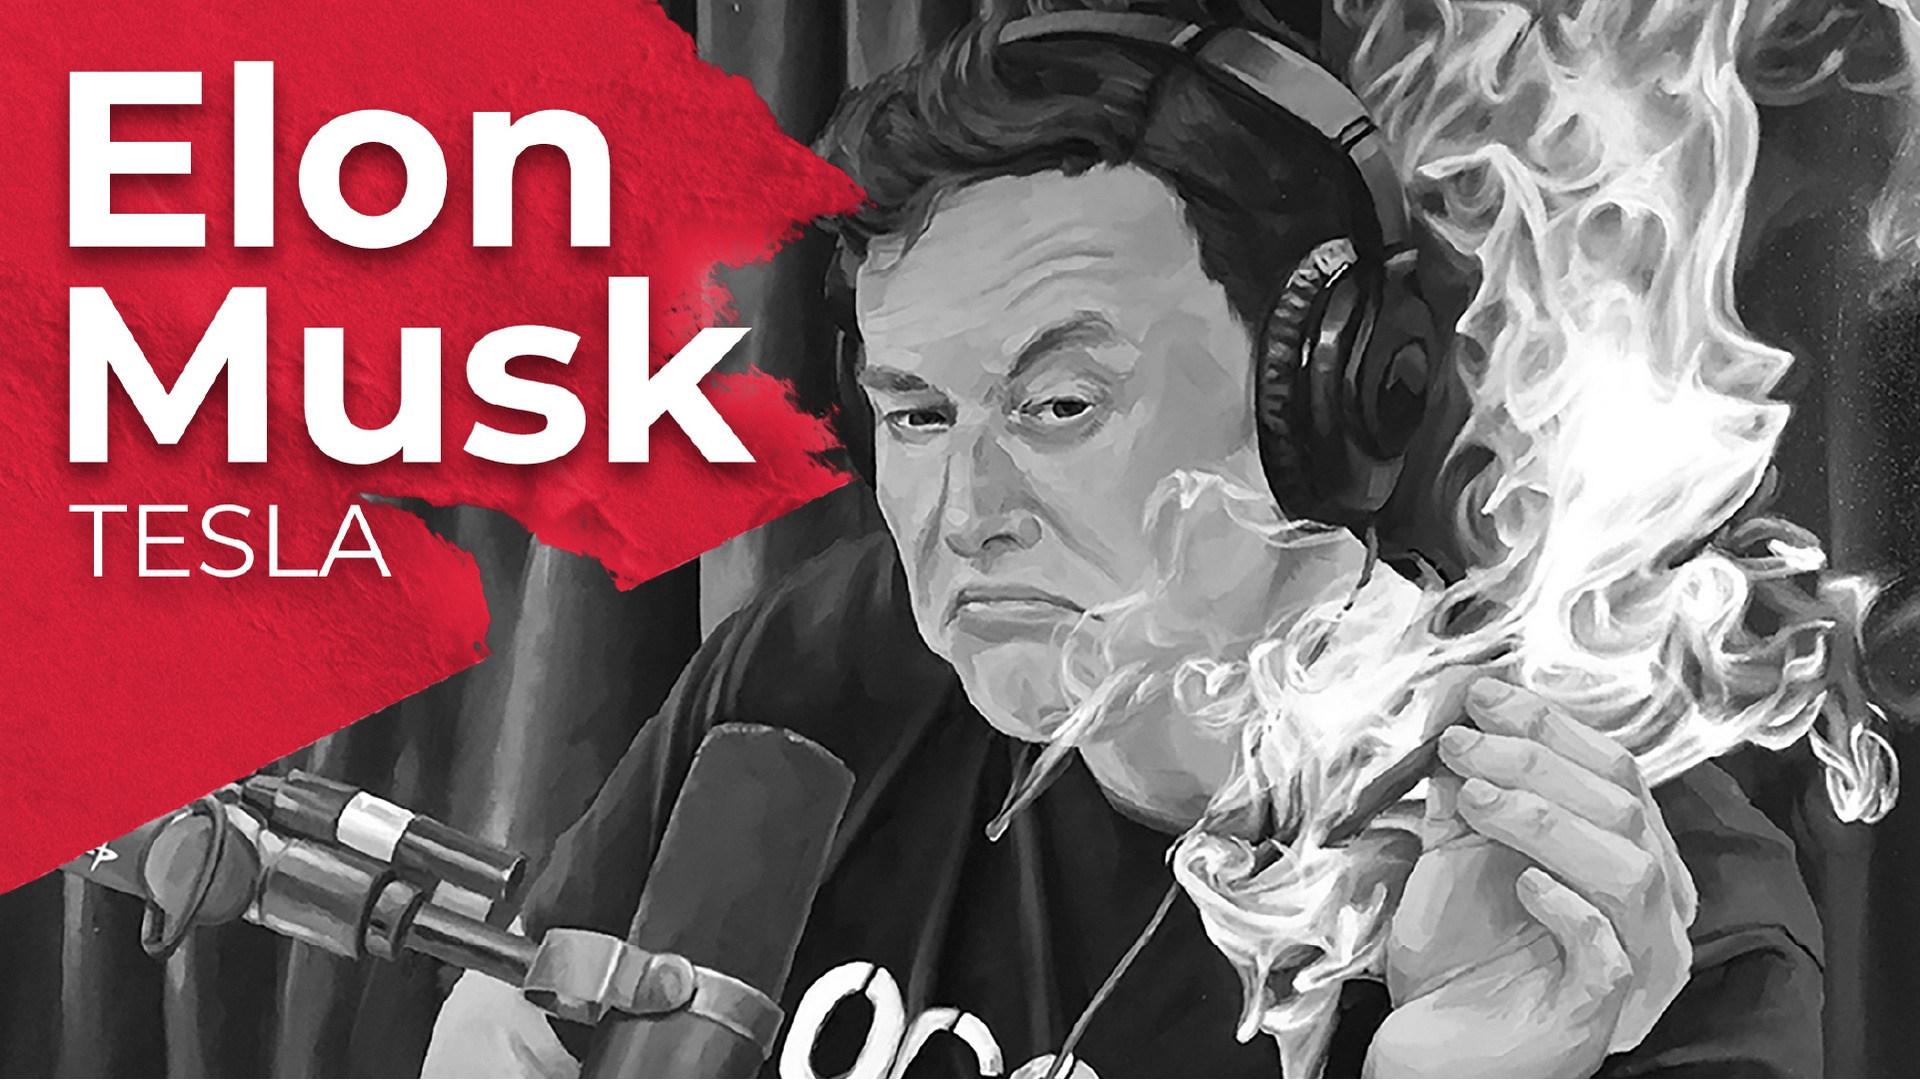 tesla, Elon Musk, Tesla Motors, Musk, Cannabis, Joint, Bad Elon, Kiffen, Kiffer, Marijuana